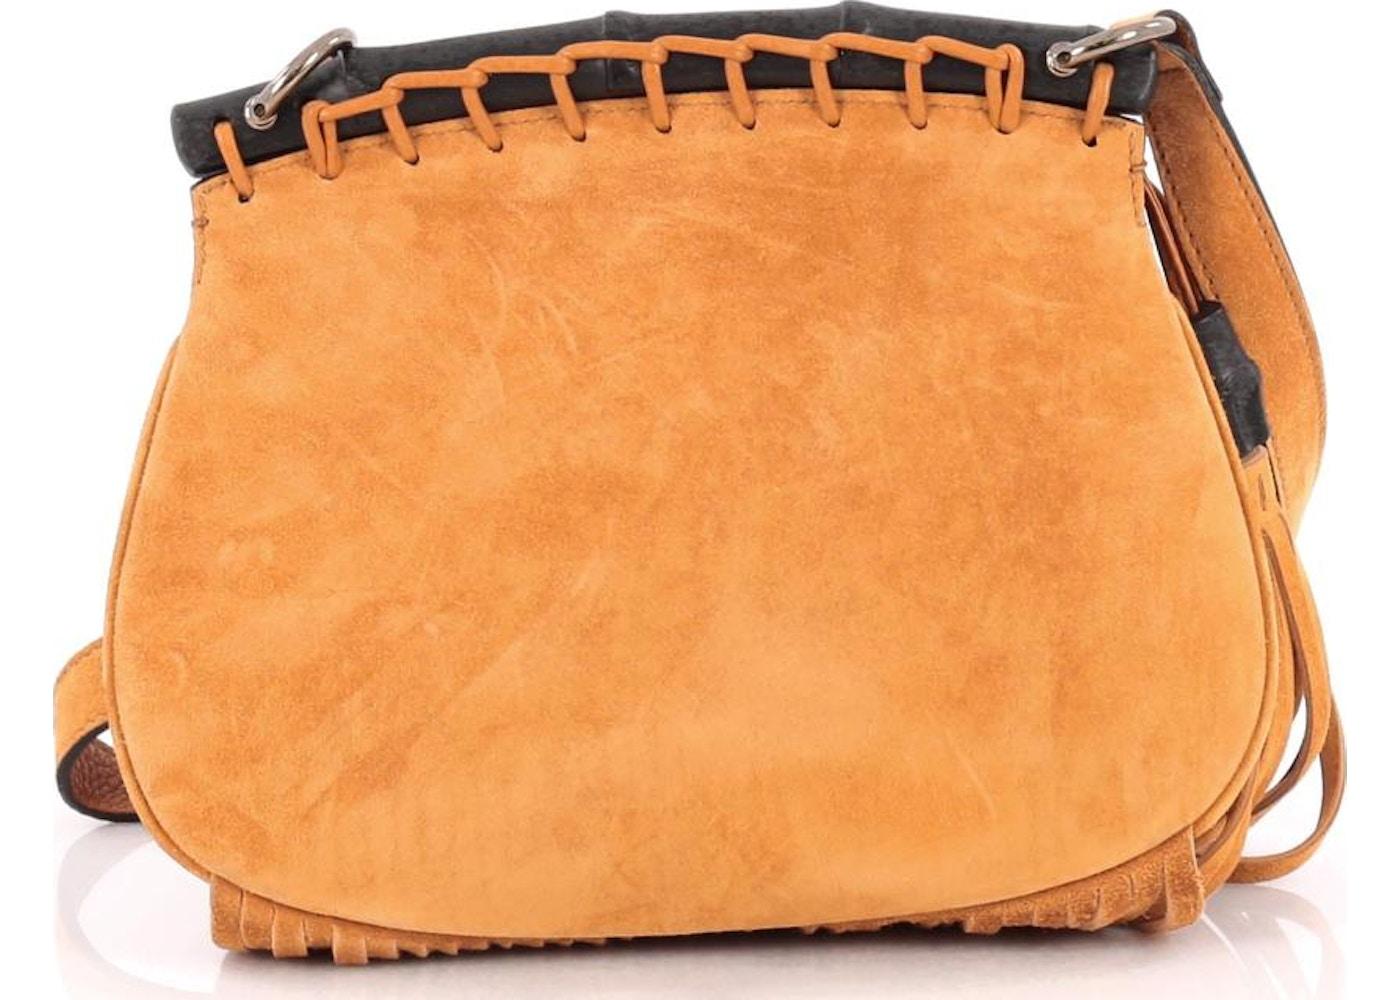 ac159492e Gucci Nouveau Fringe Crossbody Small Orange